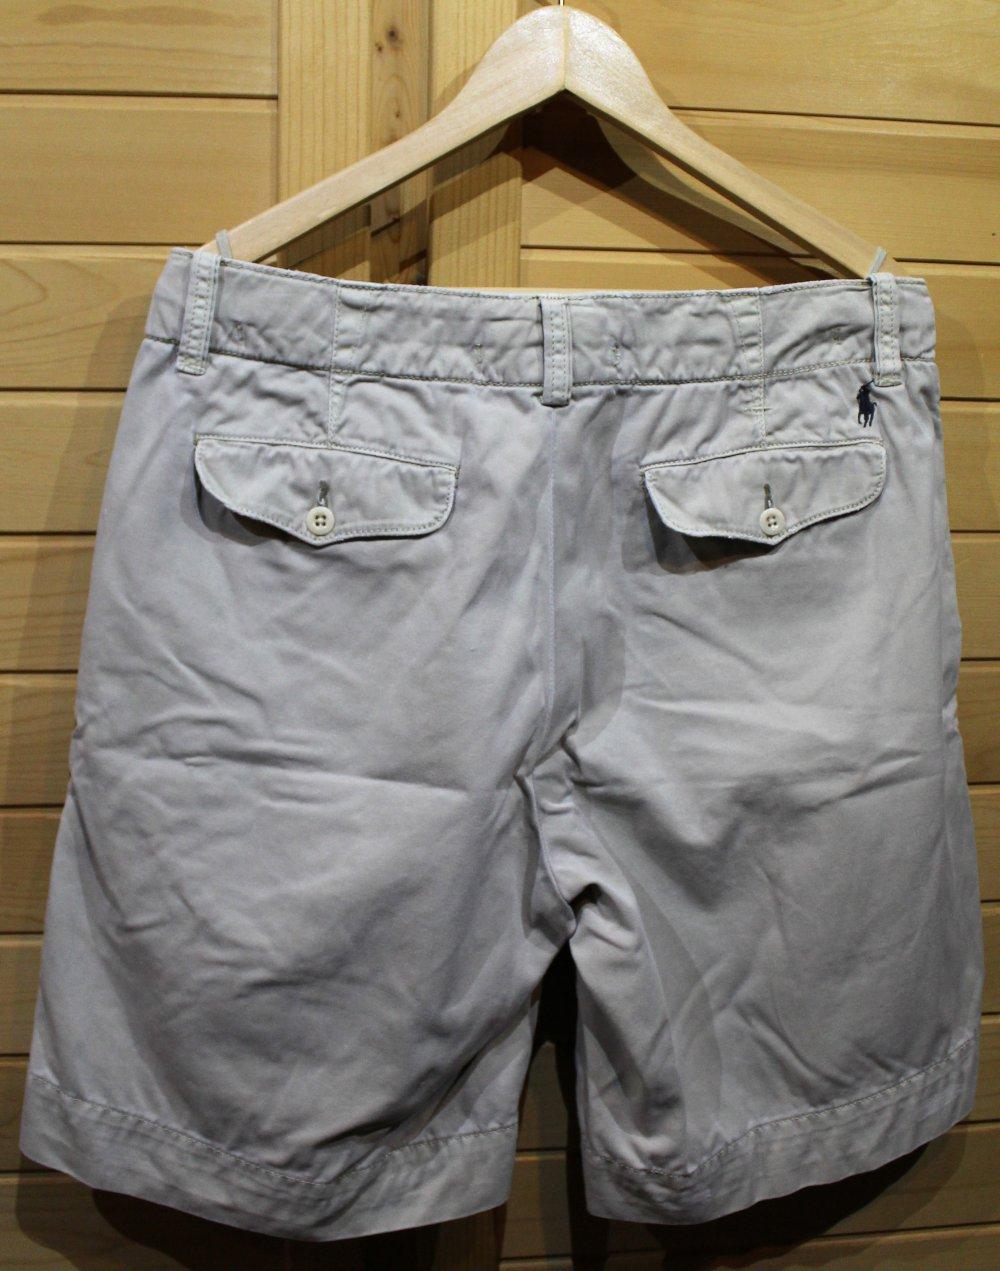 Ralph Lauren Polo Shorts Bermuda Kurze Hose Kleiderkorb De